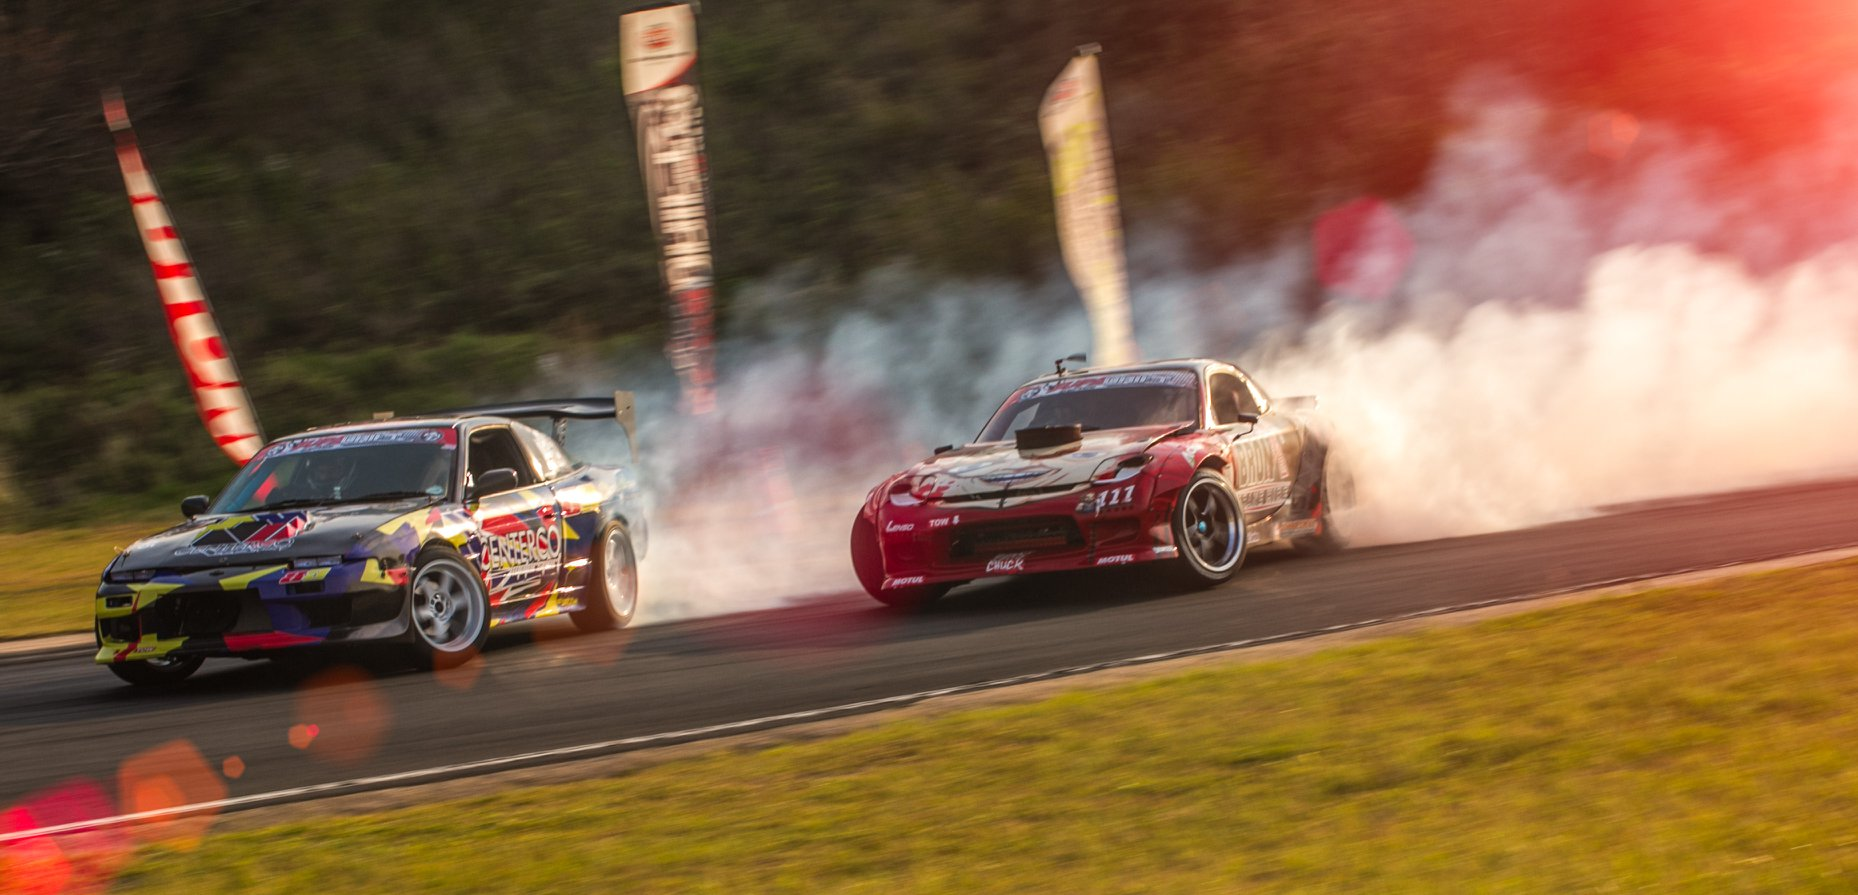 Drifting action at SupaDrift Series 05